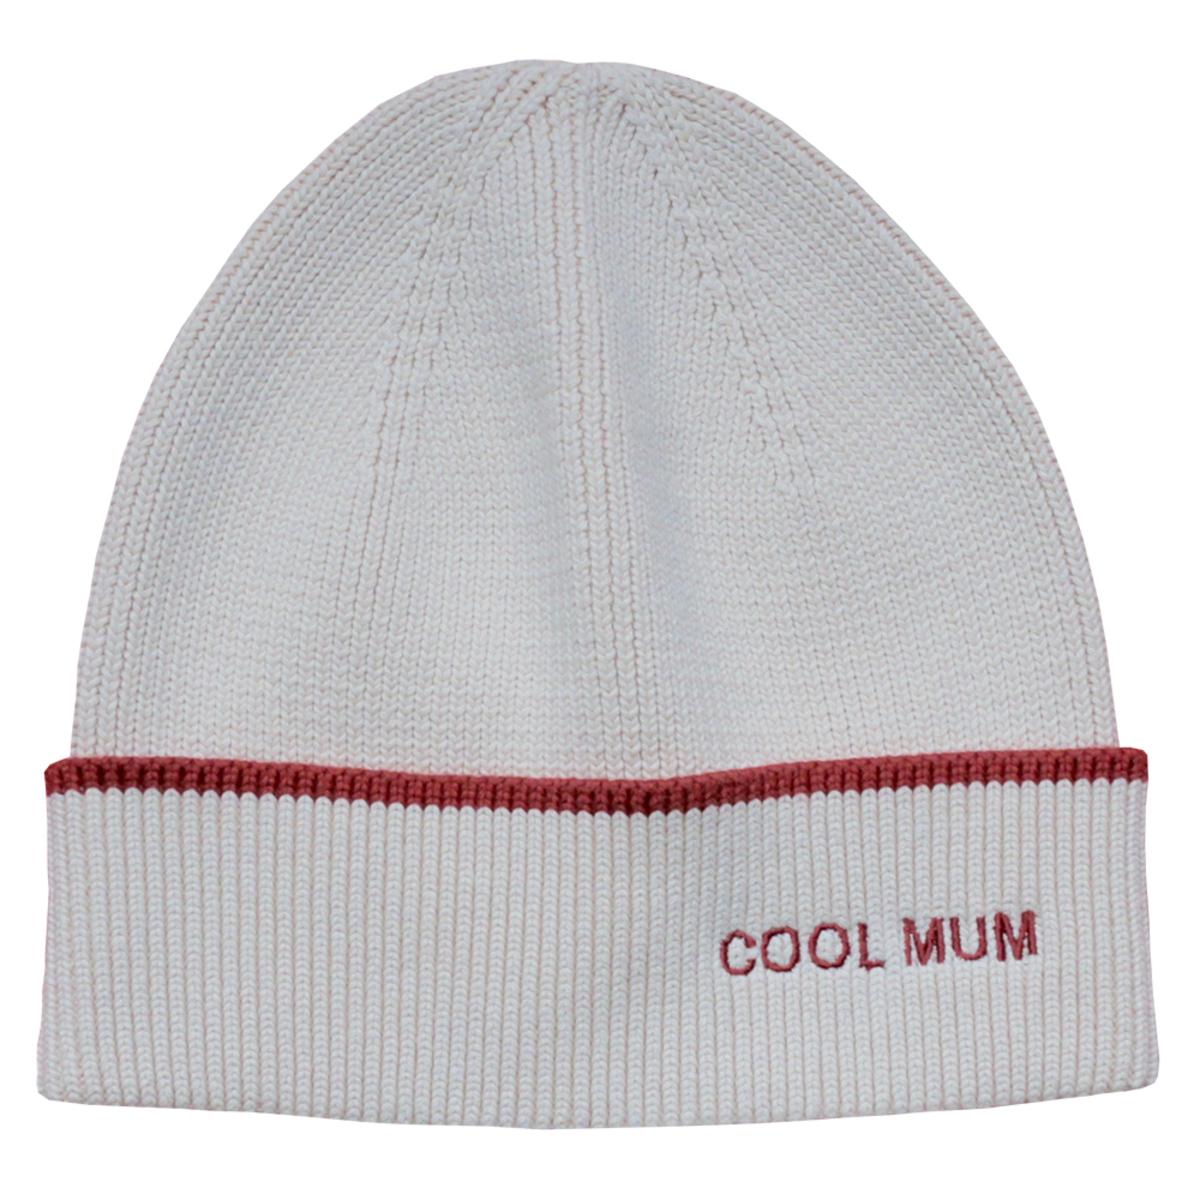 Accessoires bébé Bonnet Cool Mum - Maman Bonnet Cool Mum - Maman